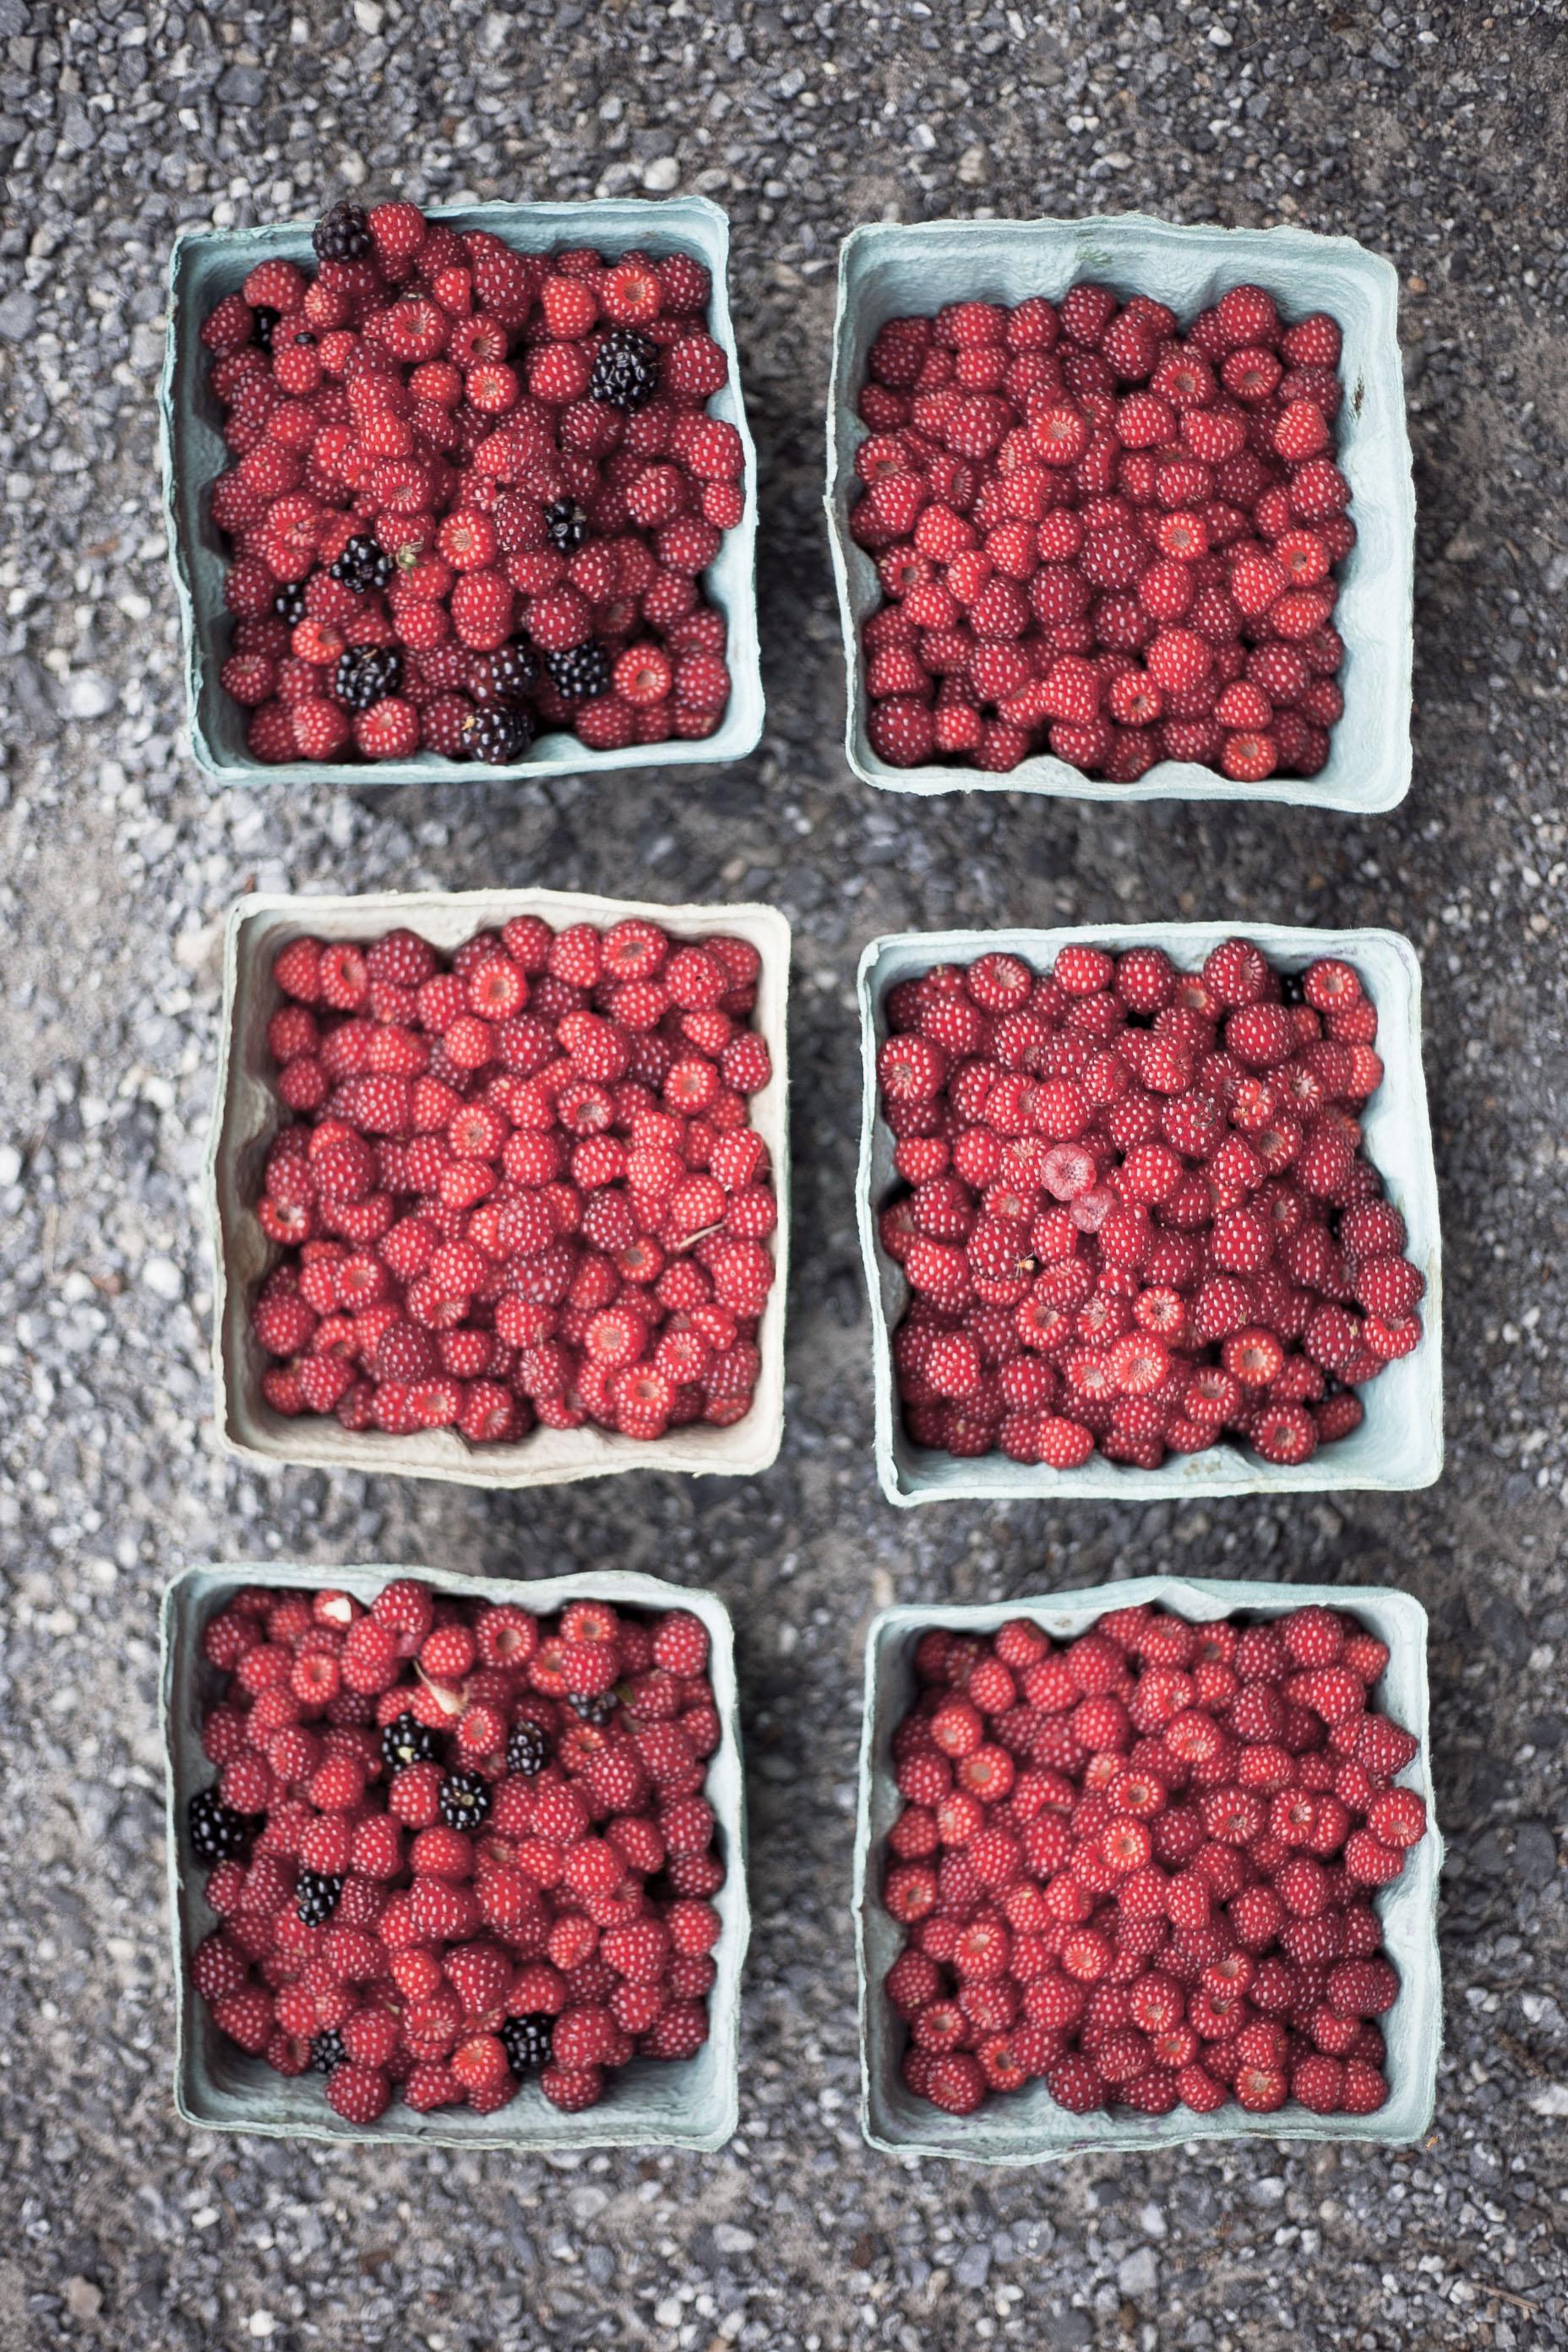 Wineberry Schaum Tortes and Pavlovas